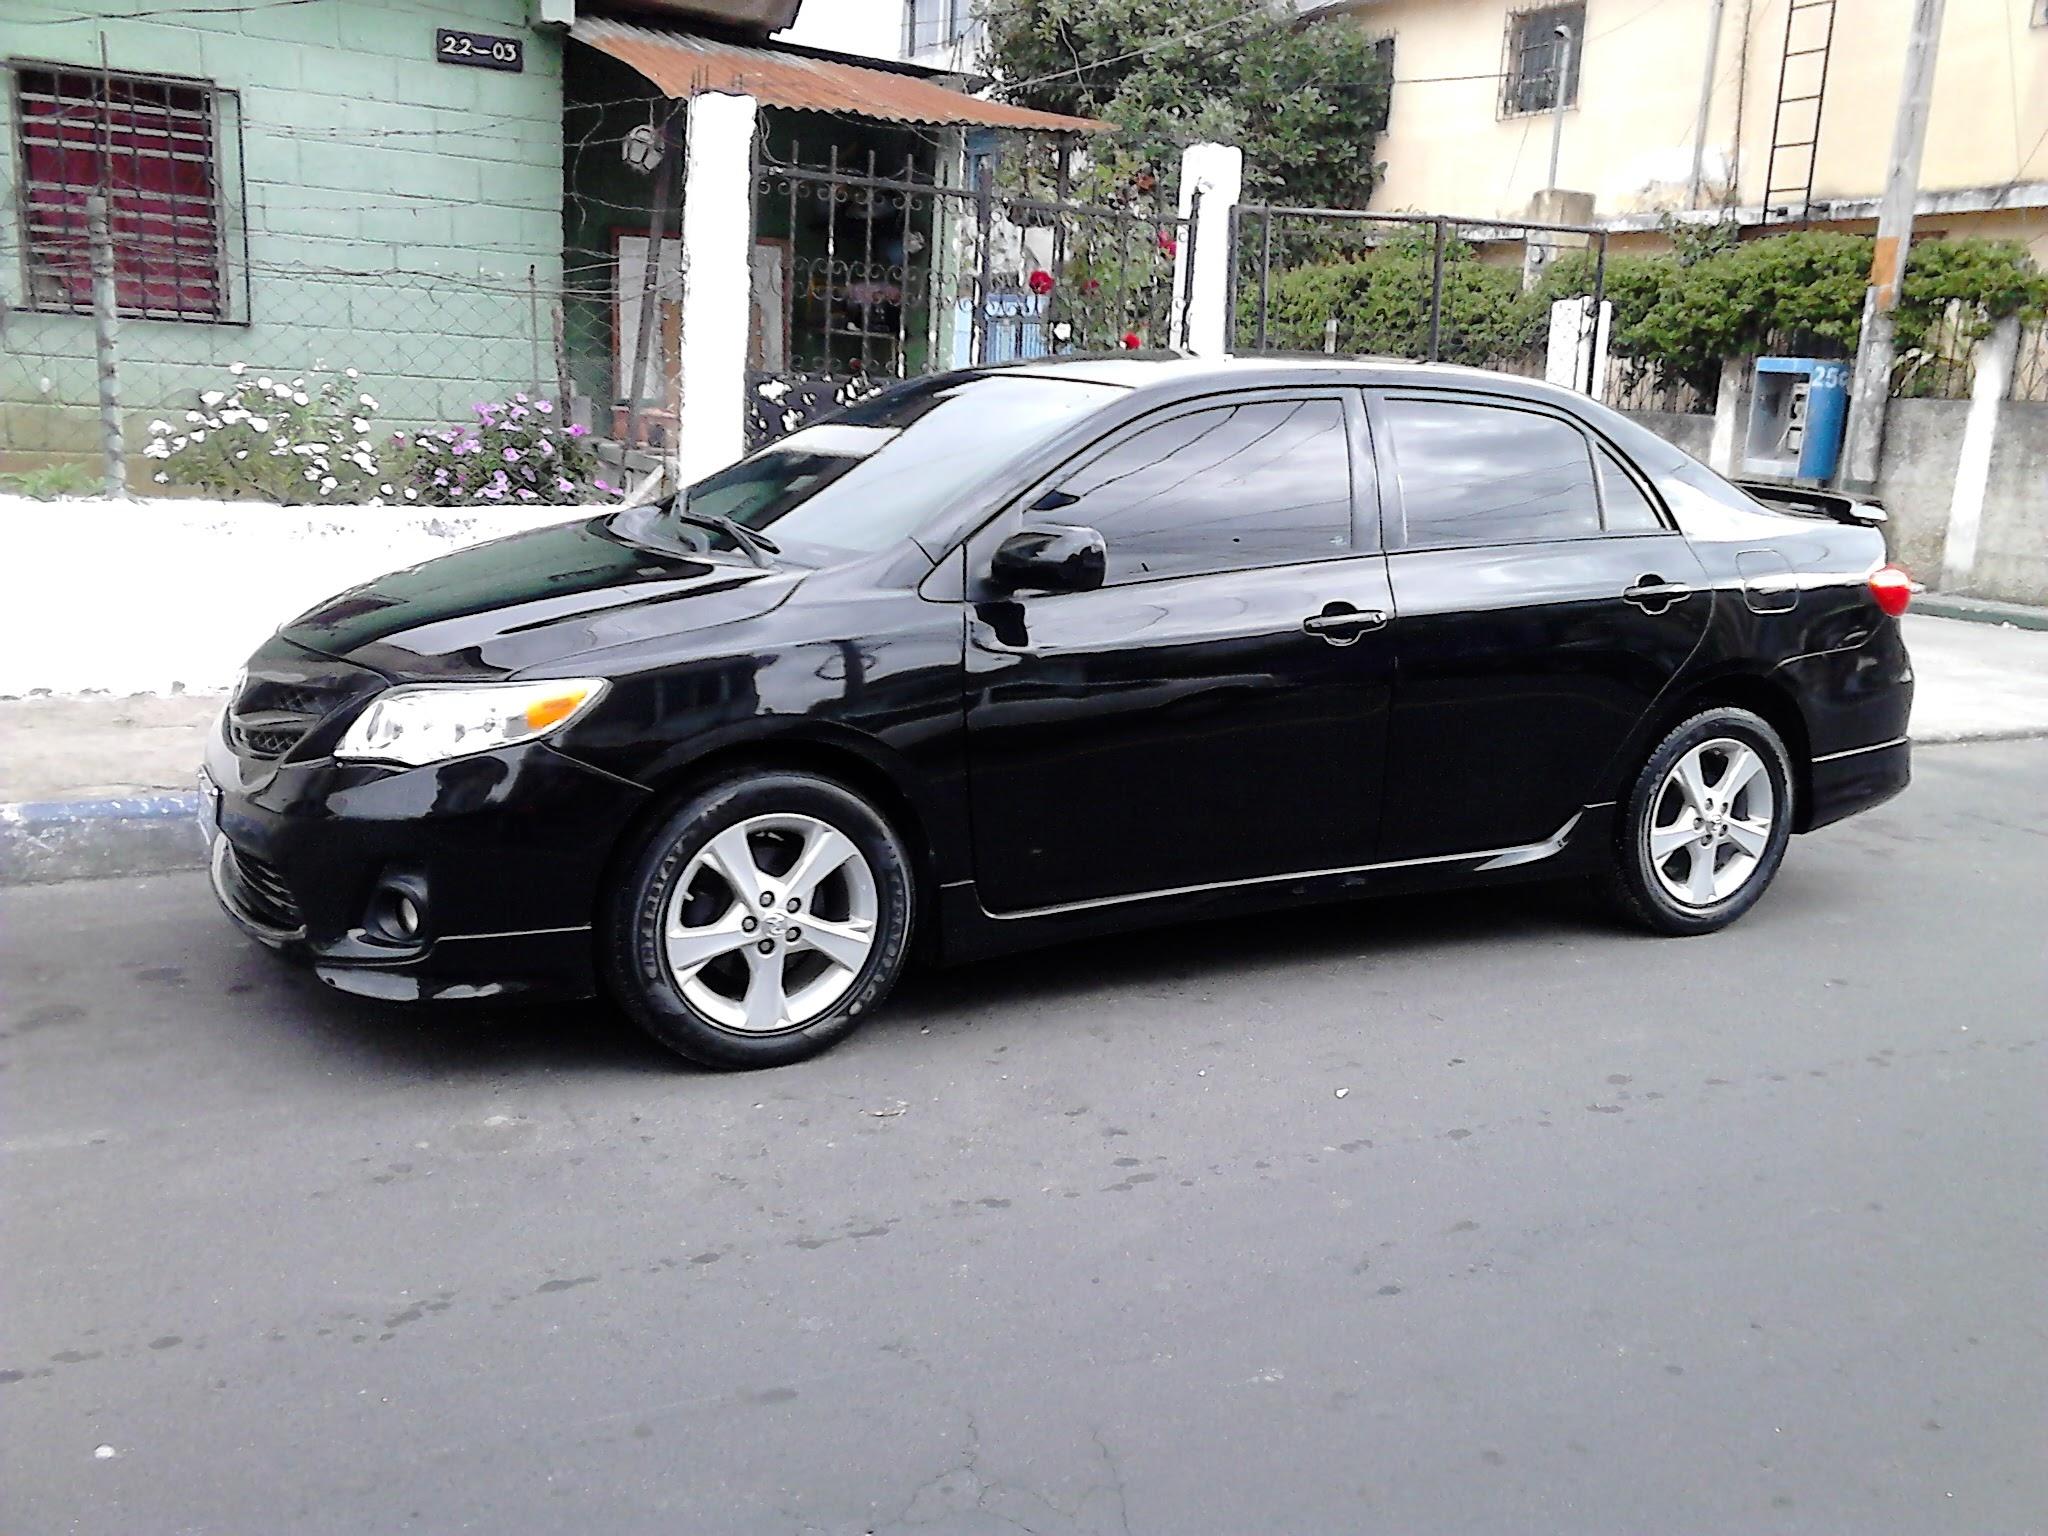 Usados: Toyota Corolla S 2011 automático color negro